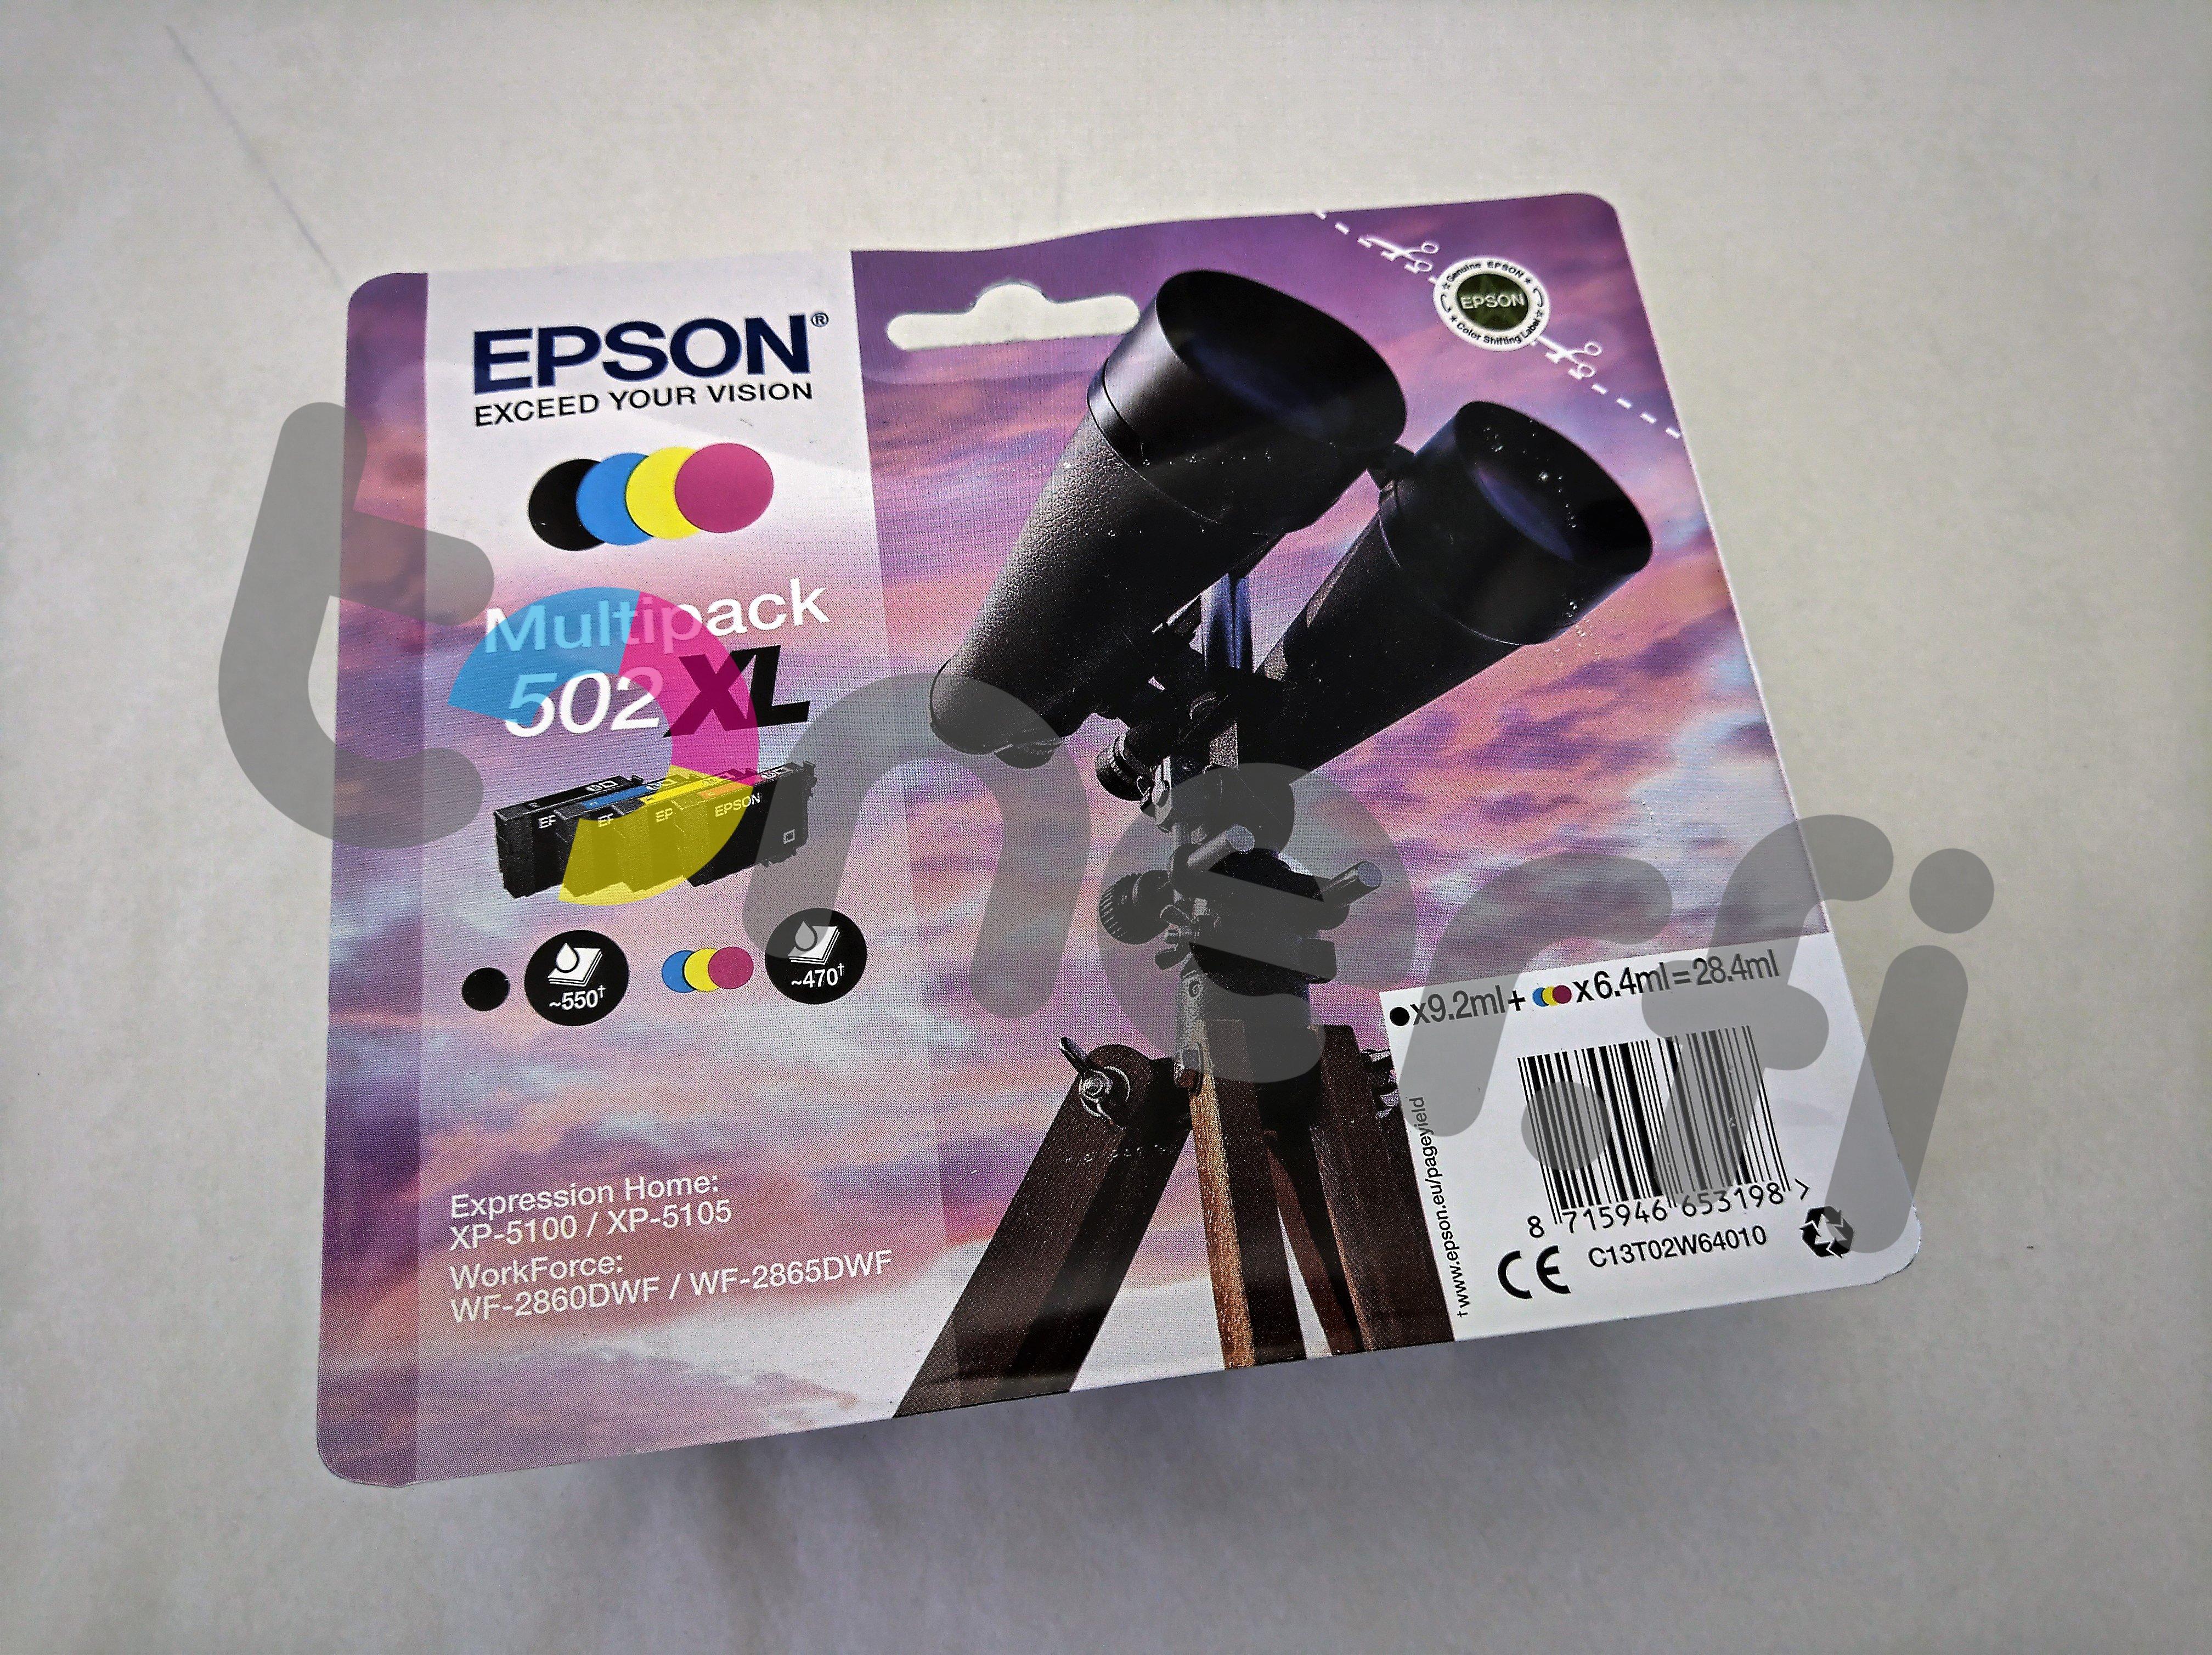 Epson 502 XL Multipack C13T02W64010